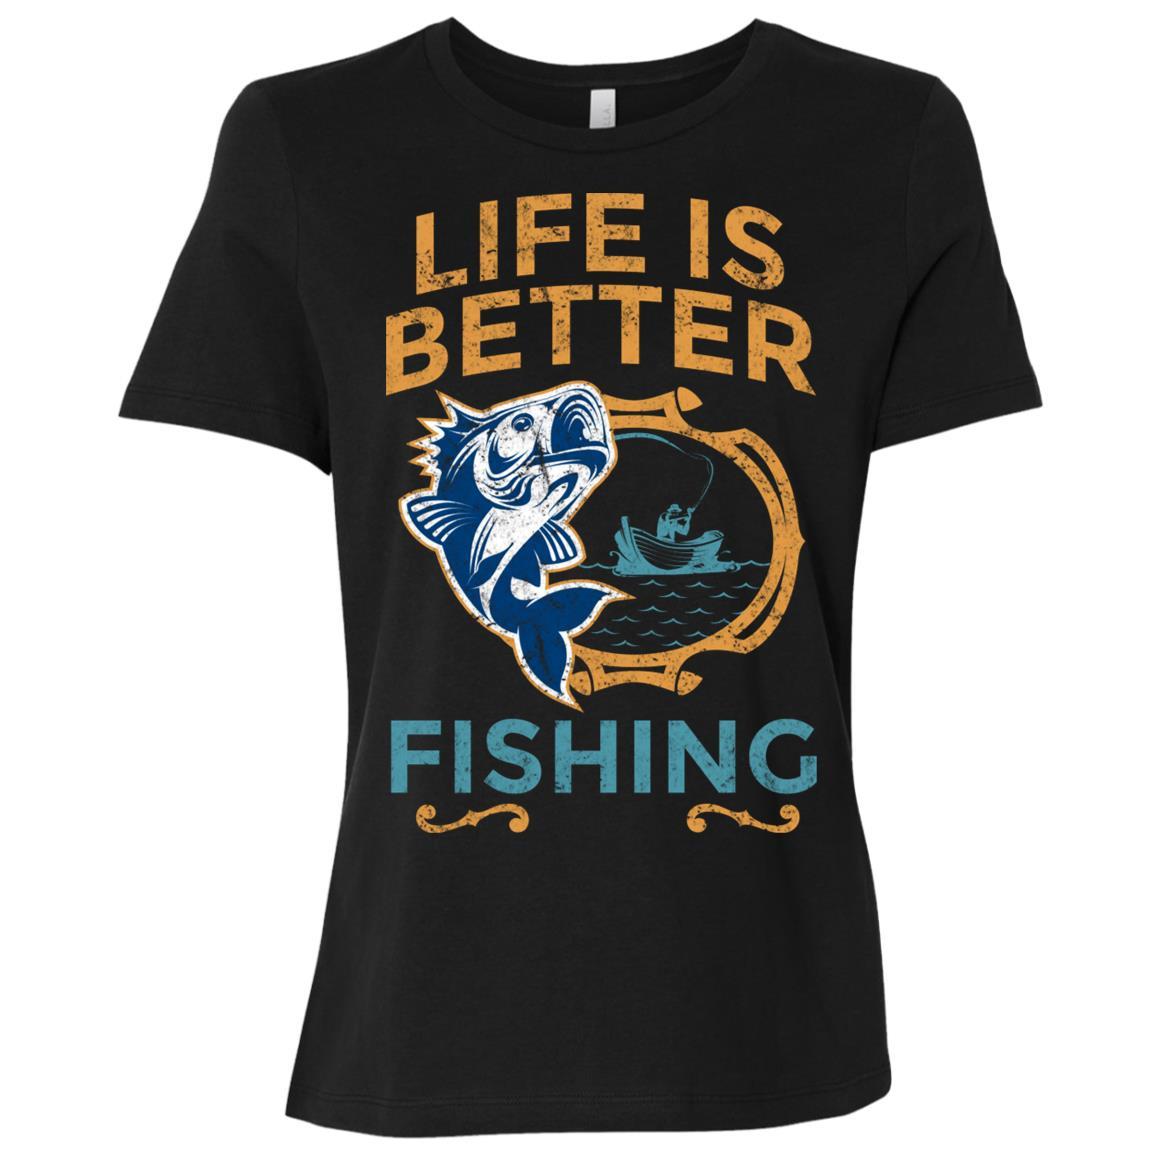 Life Is Better Fishing Large Mouth Bass-1 Women Short Sleeve T-Shirt